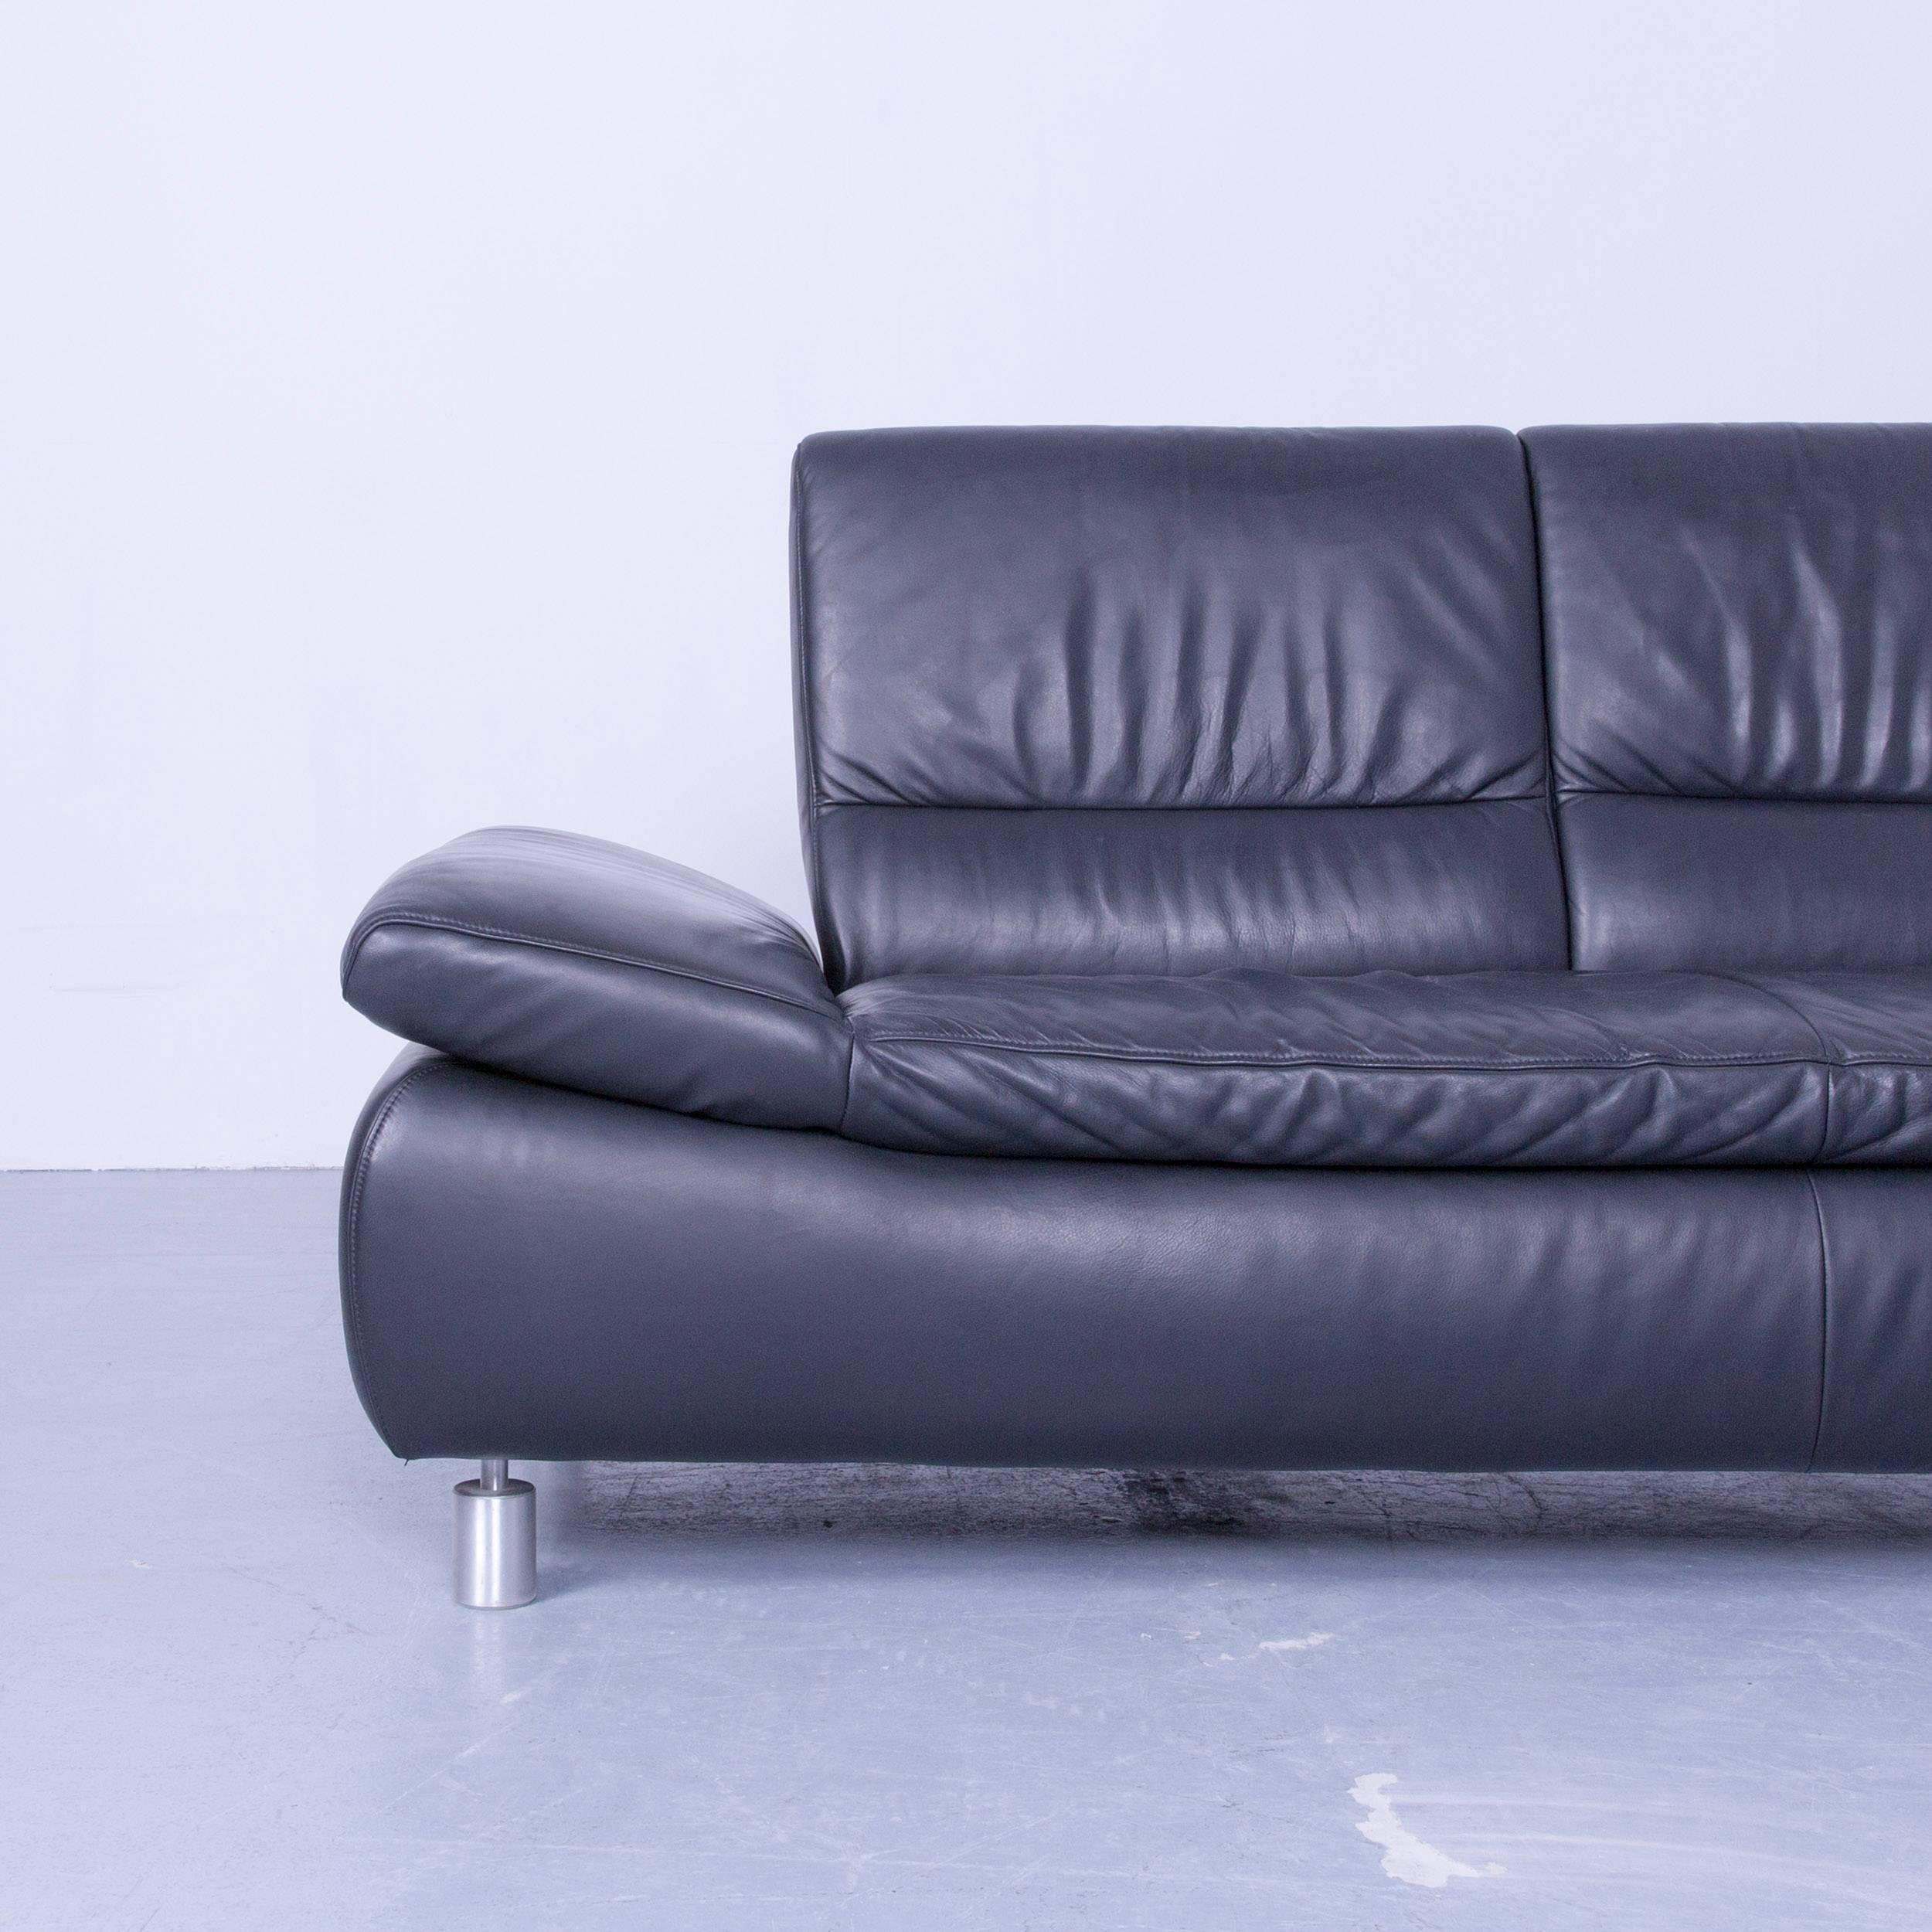 Black Original Koinor Designer Leather Sofa In A Minimalistic And Modern  Design Made For Pure Comfort